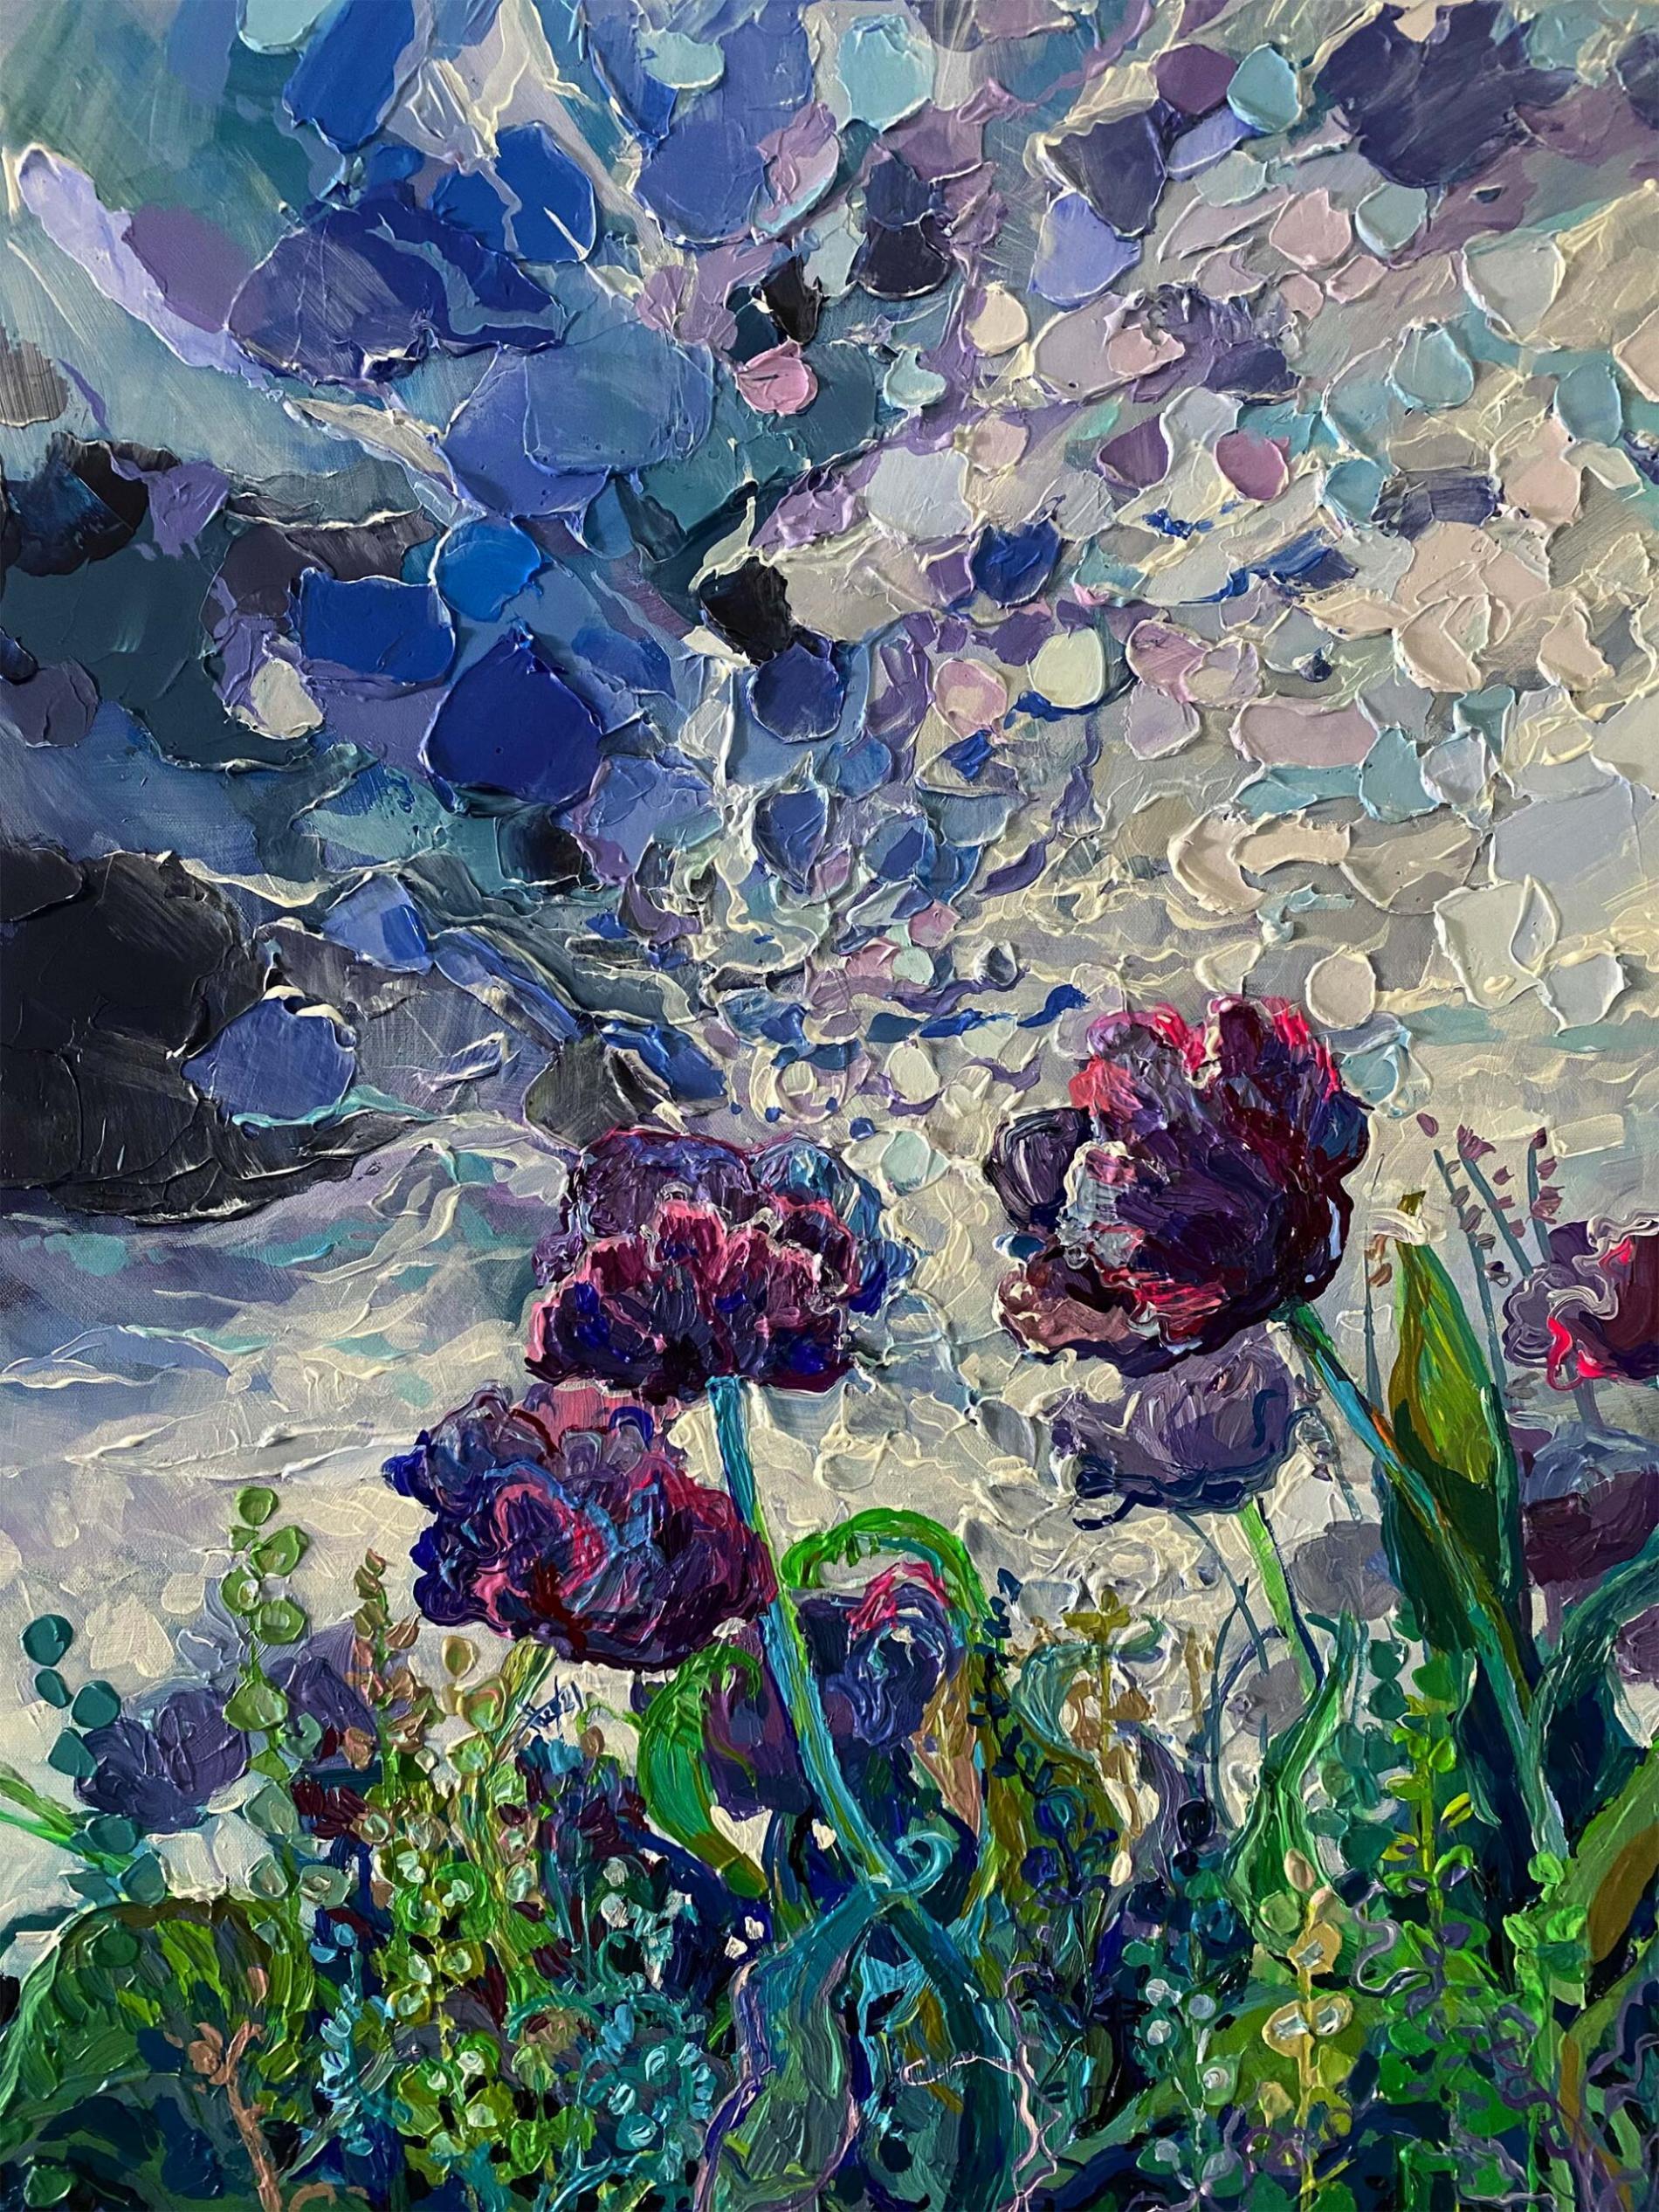 trusova impresionismo grafico flores